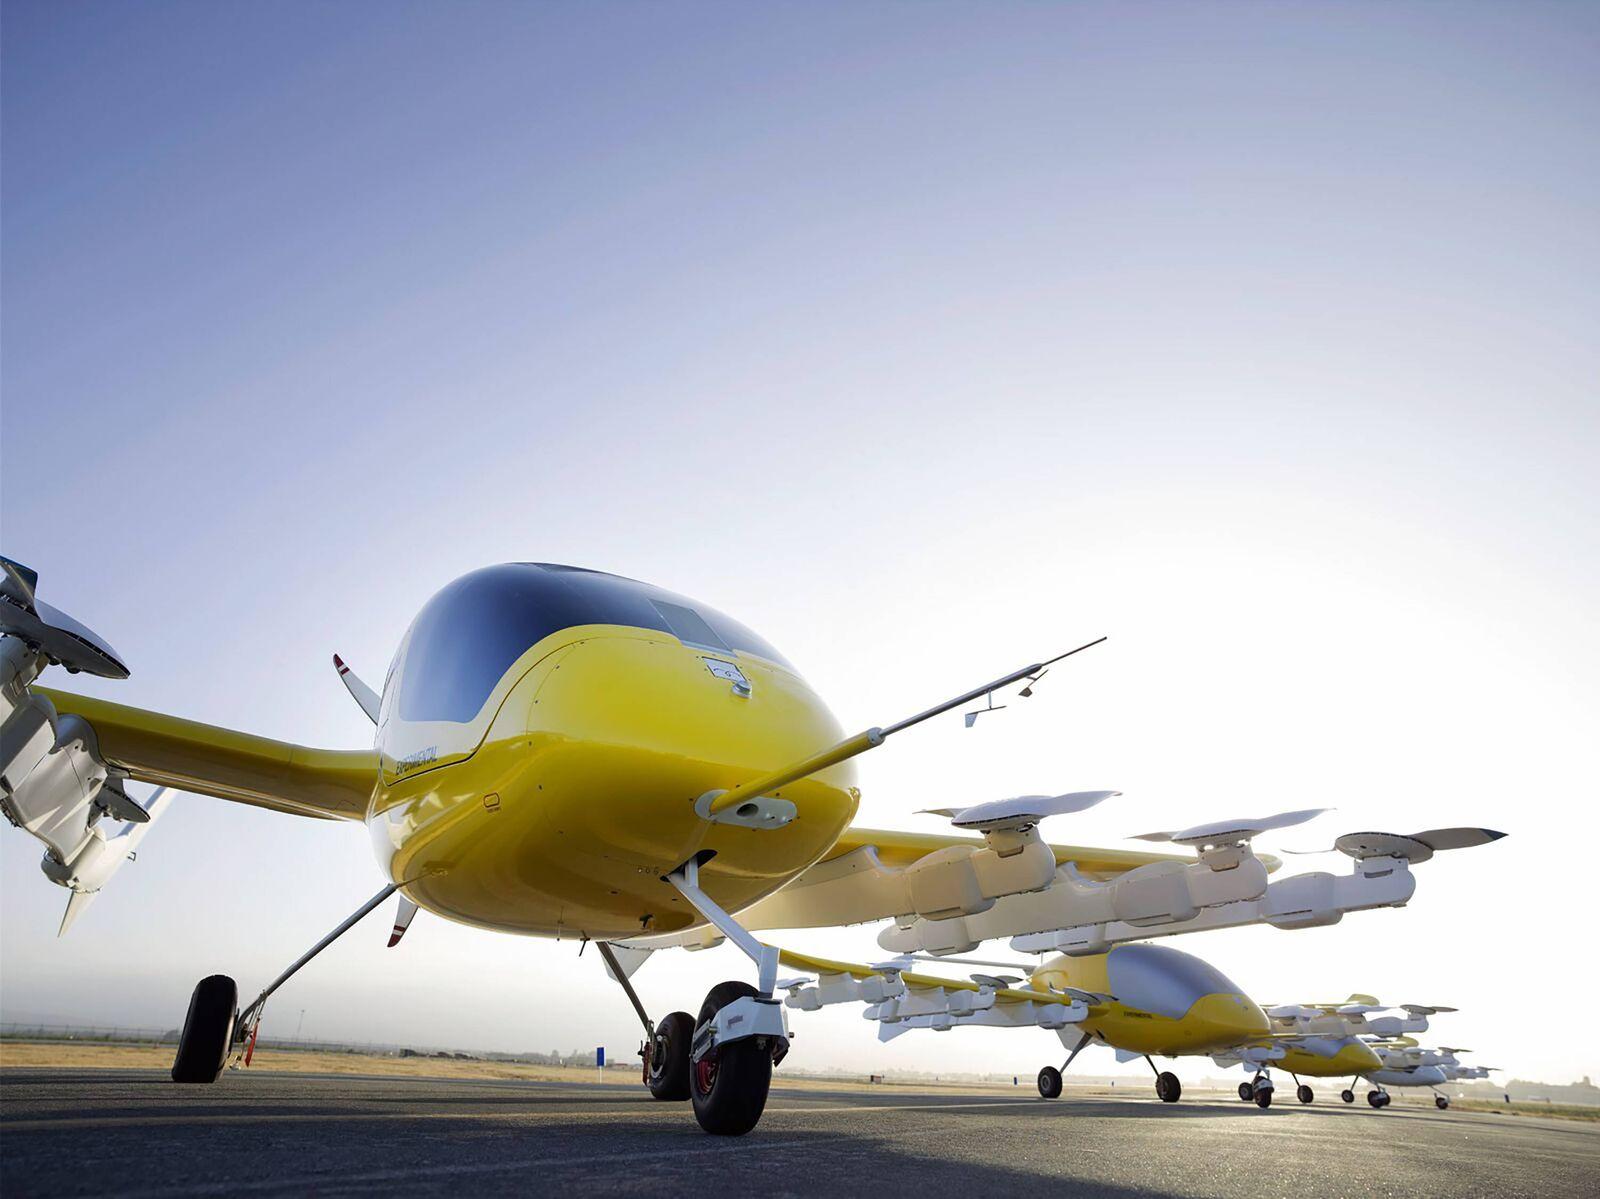 181017 WELLINGTON Oct 17 2018 Photo released by shows autonomous electric air Taxi Cora